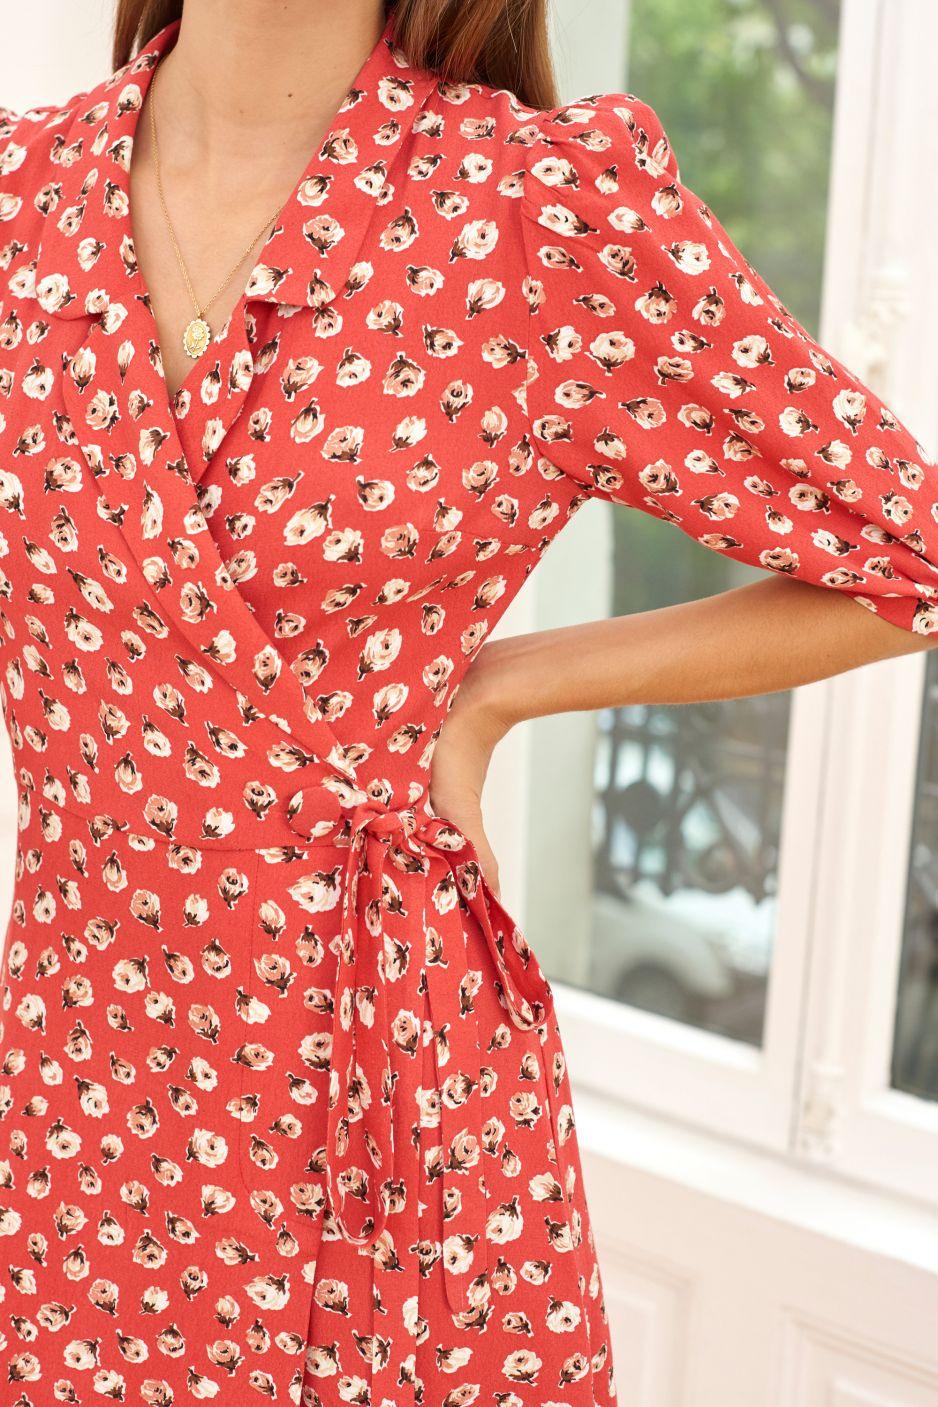 Rouje louisa-mamie rose rouge-2